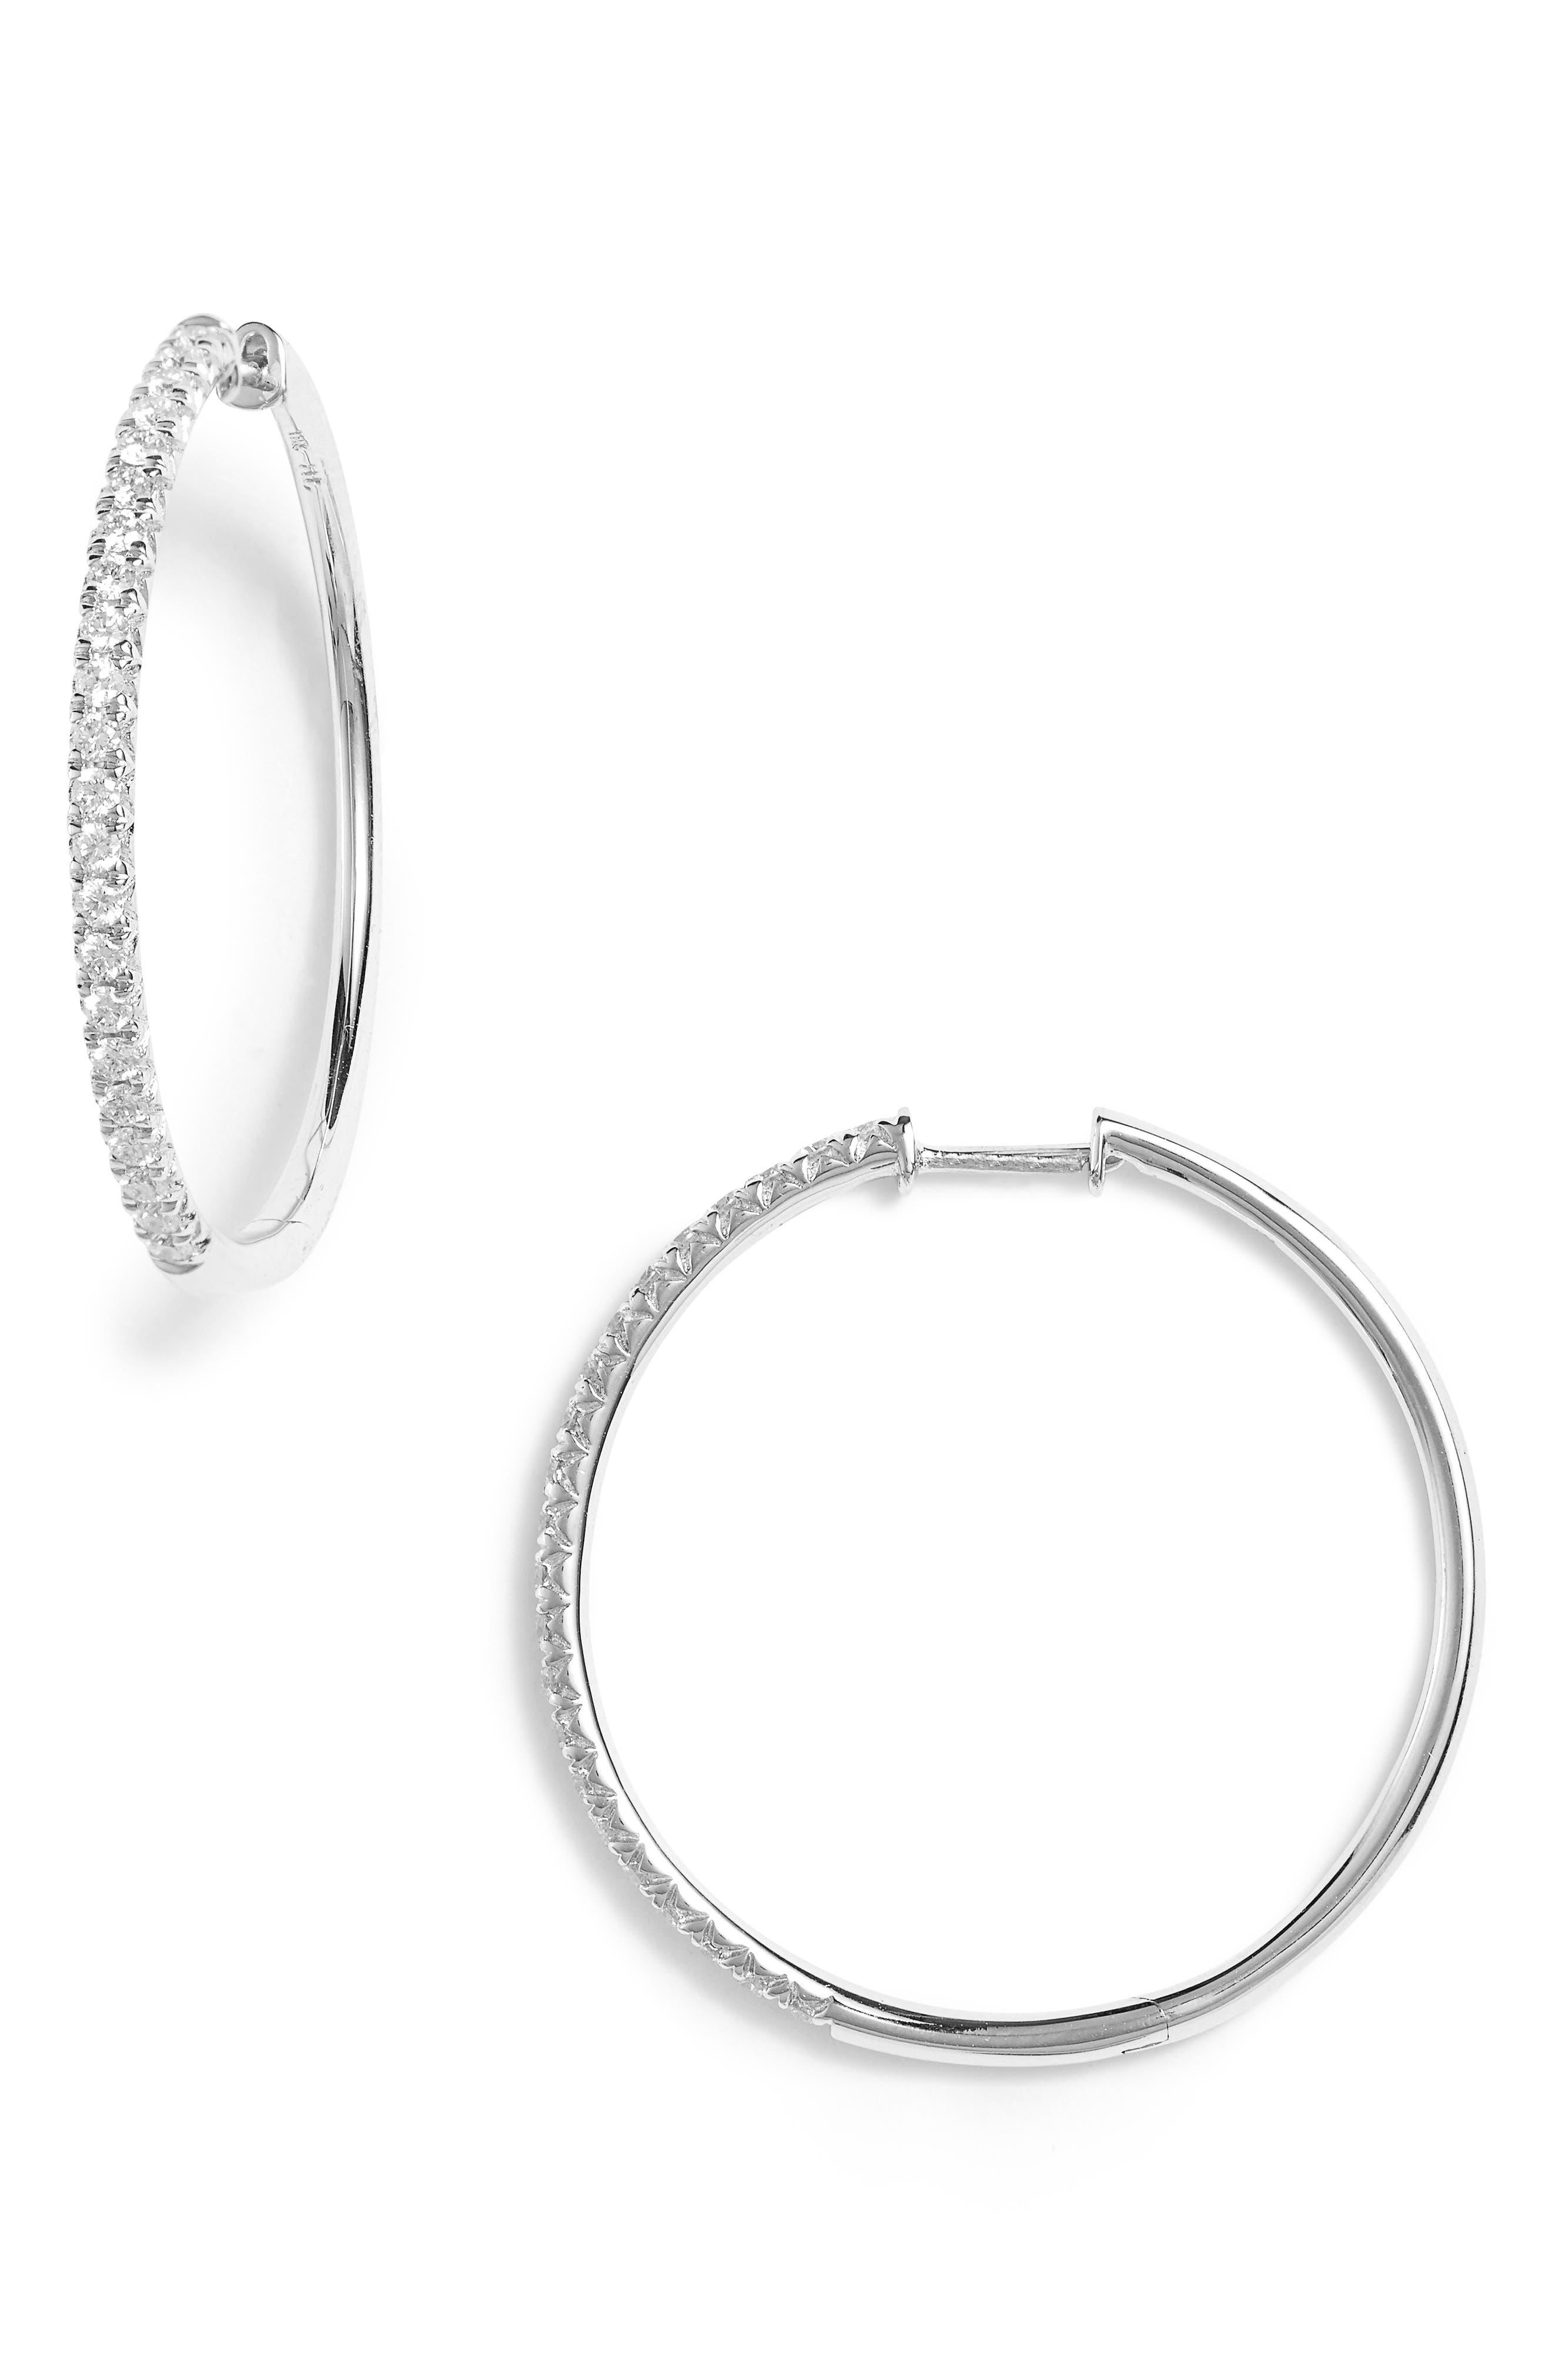 Alternate Image 1 Selected - Bony Levy Kiera French Cut Diamond Hoop Earrings (Nordstrom Exclusive)